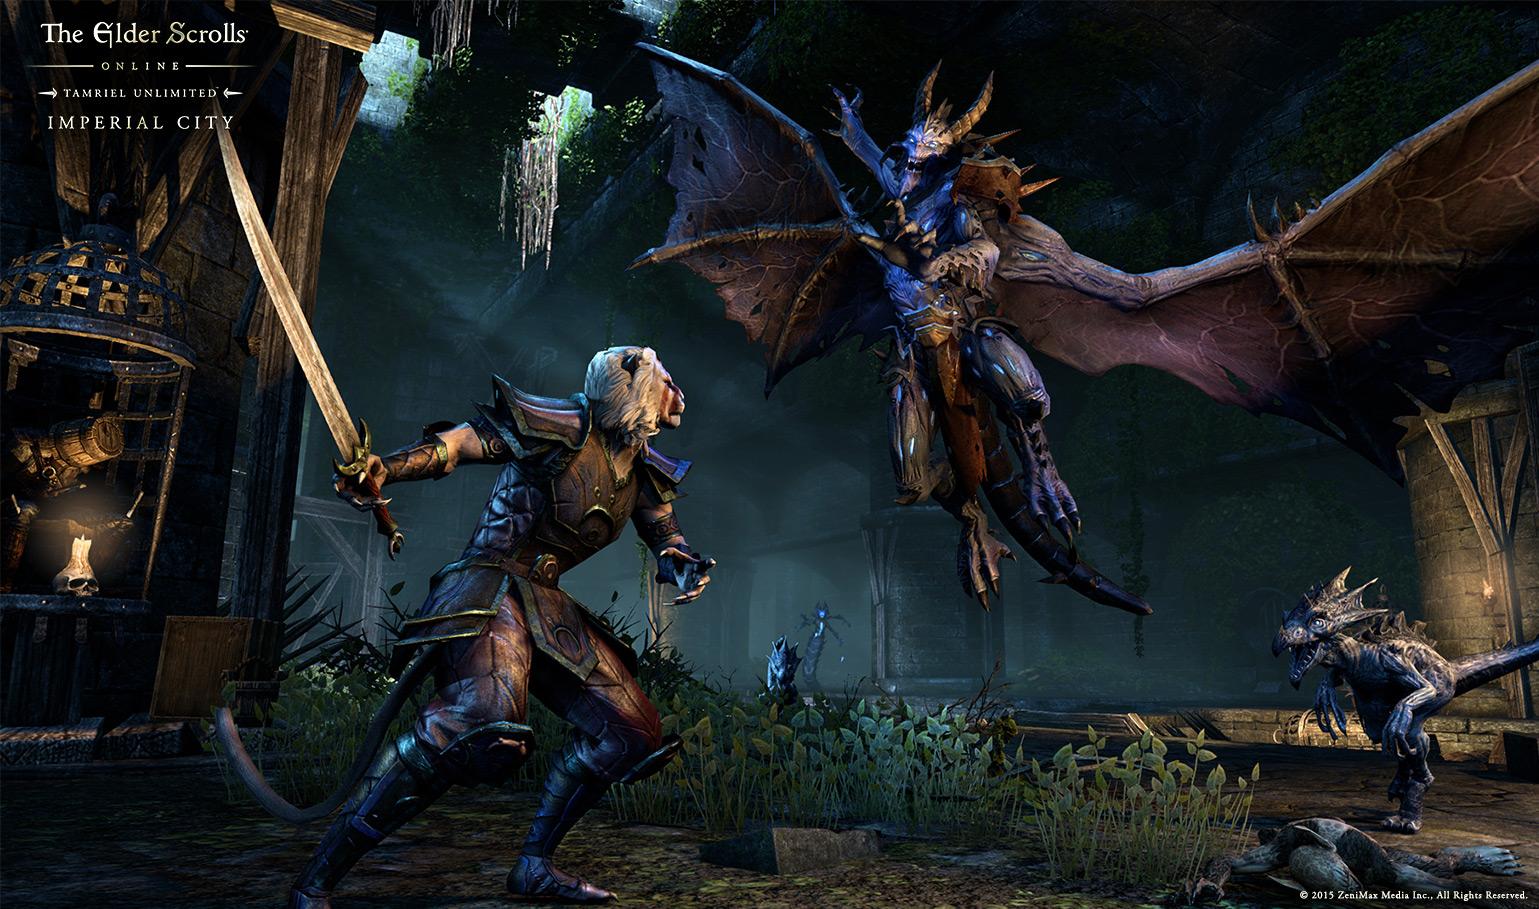 Elder Scrolls Online Tamriel Unlimited Screenshot Daedra Slayer